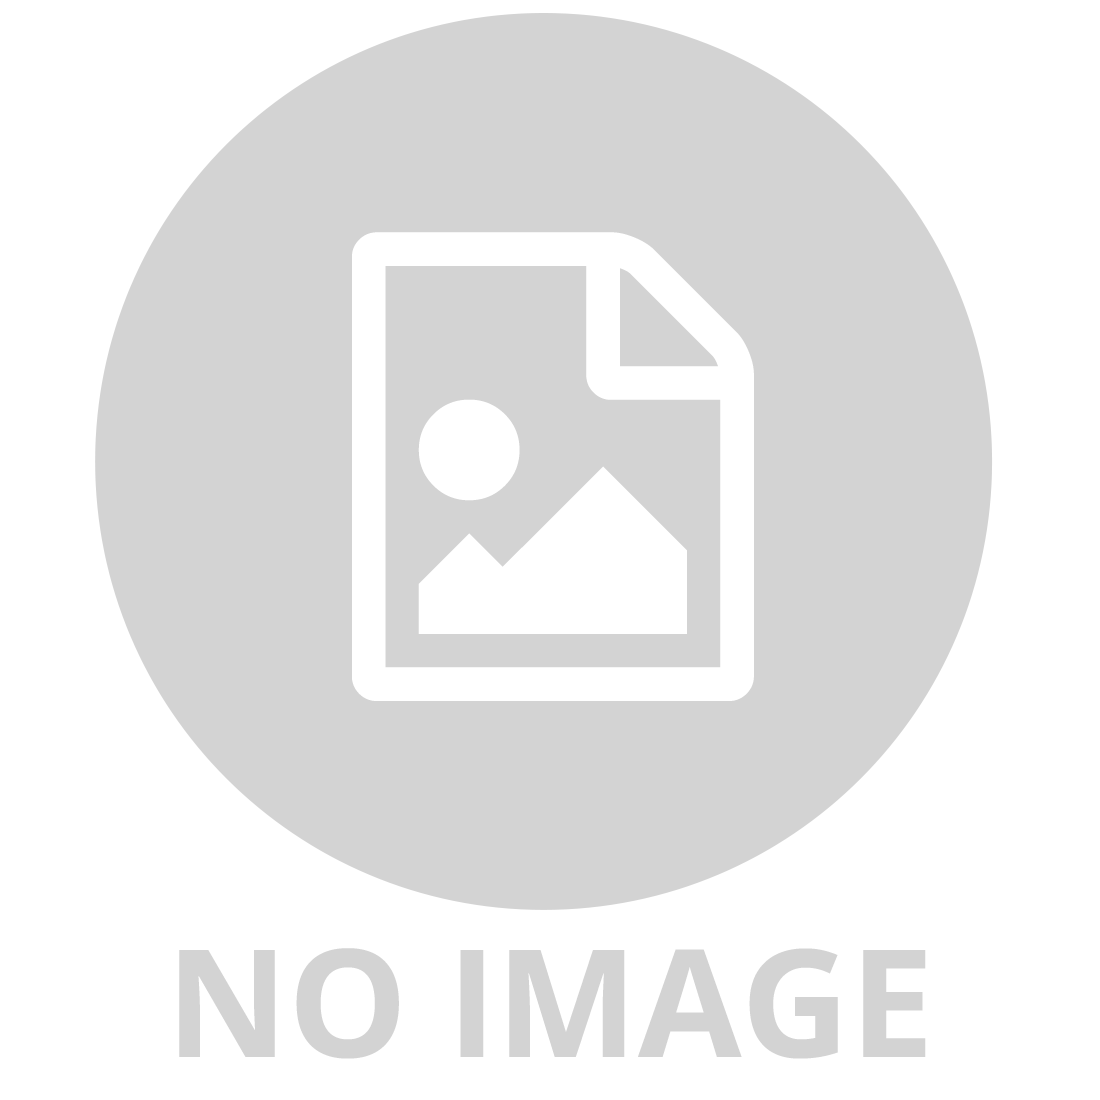 ROYAL CANASTA PLAYING CARDS